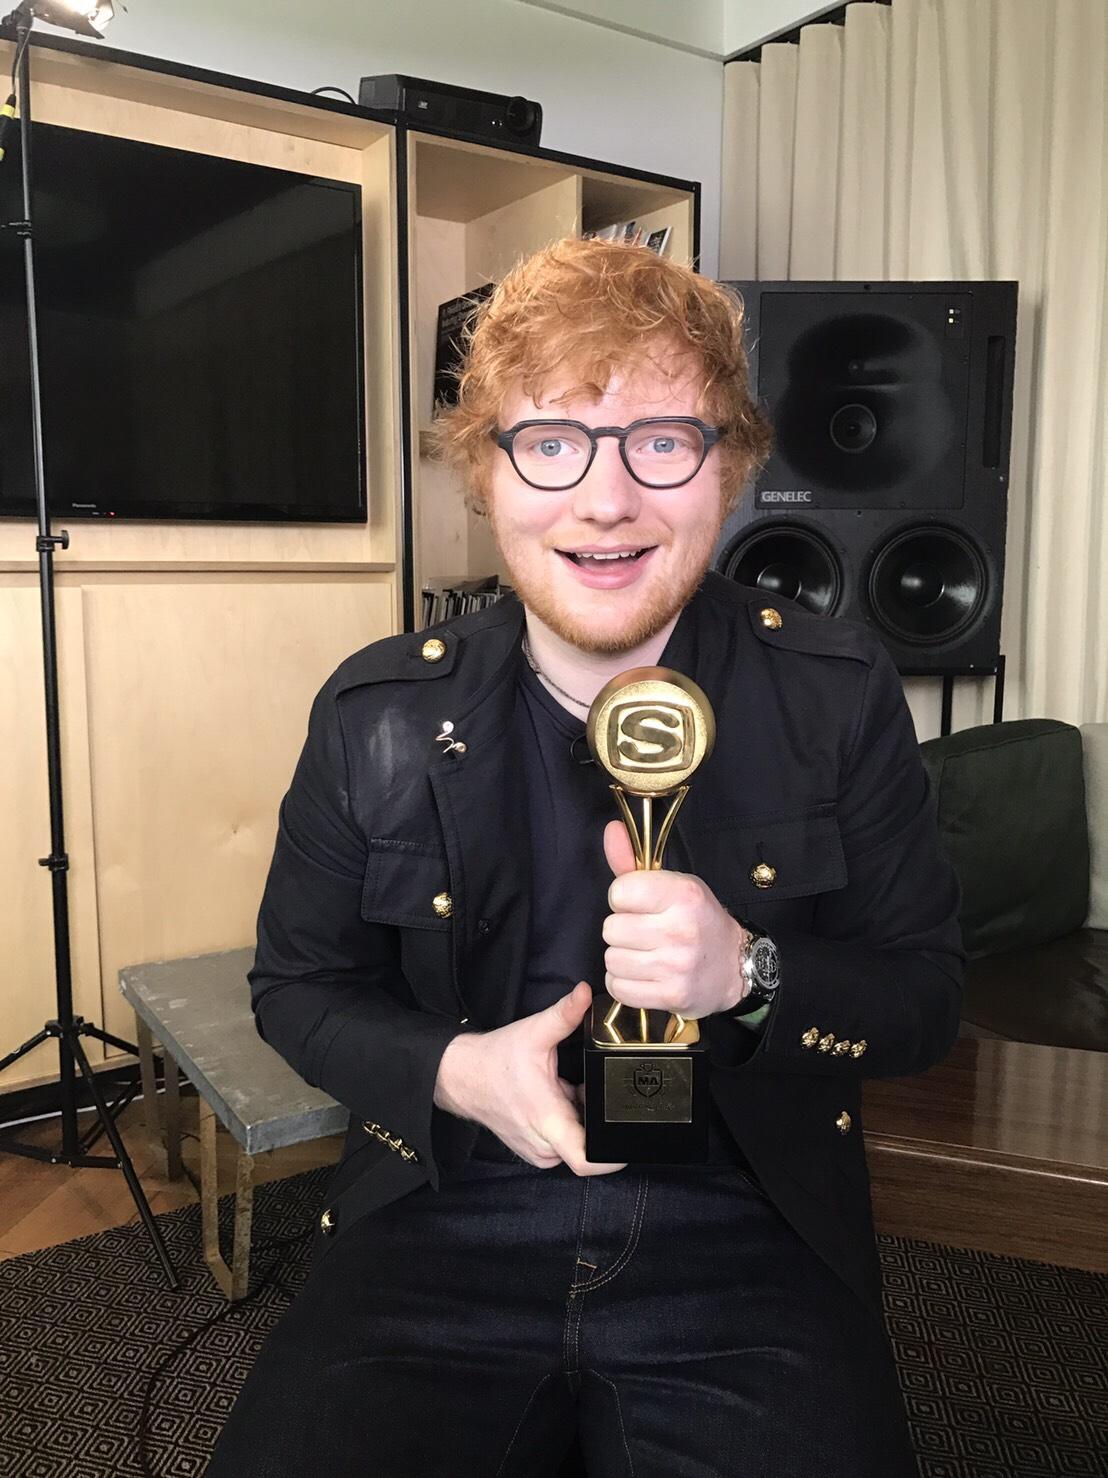 ED-SHEERAN - SPACE SHOWER MUSIC AWARDS 2018